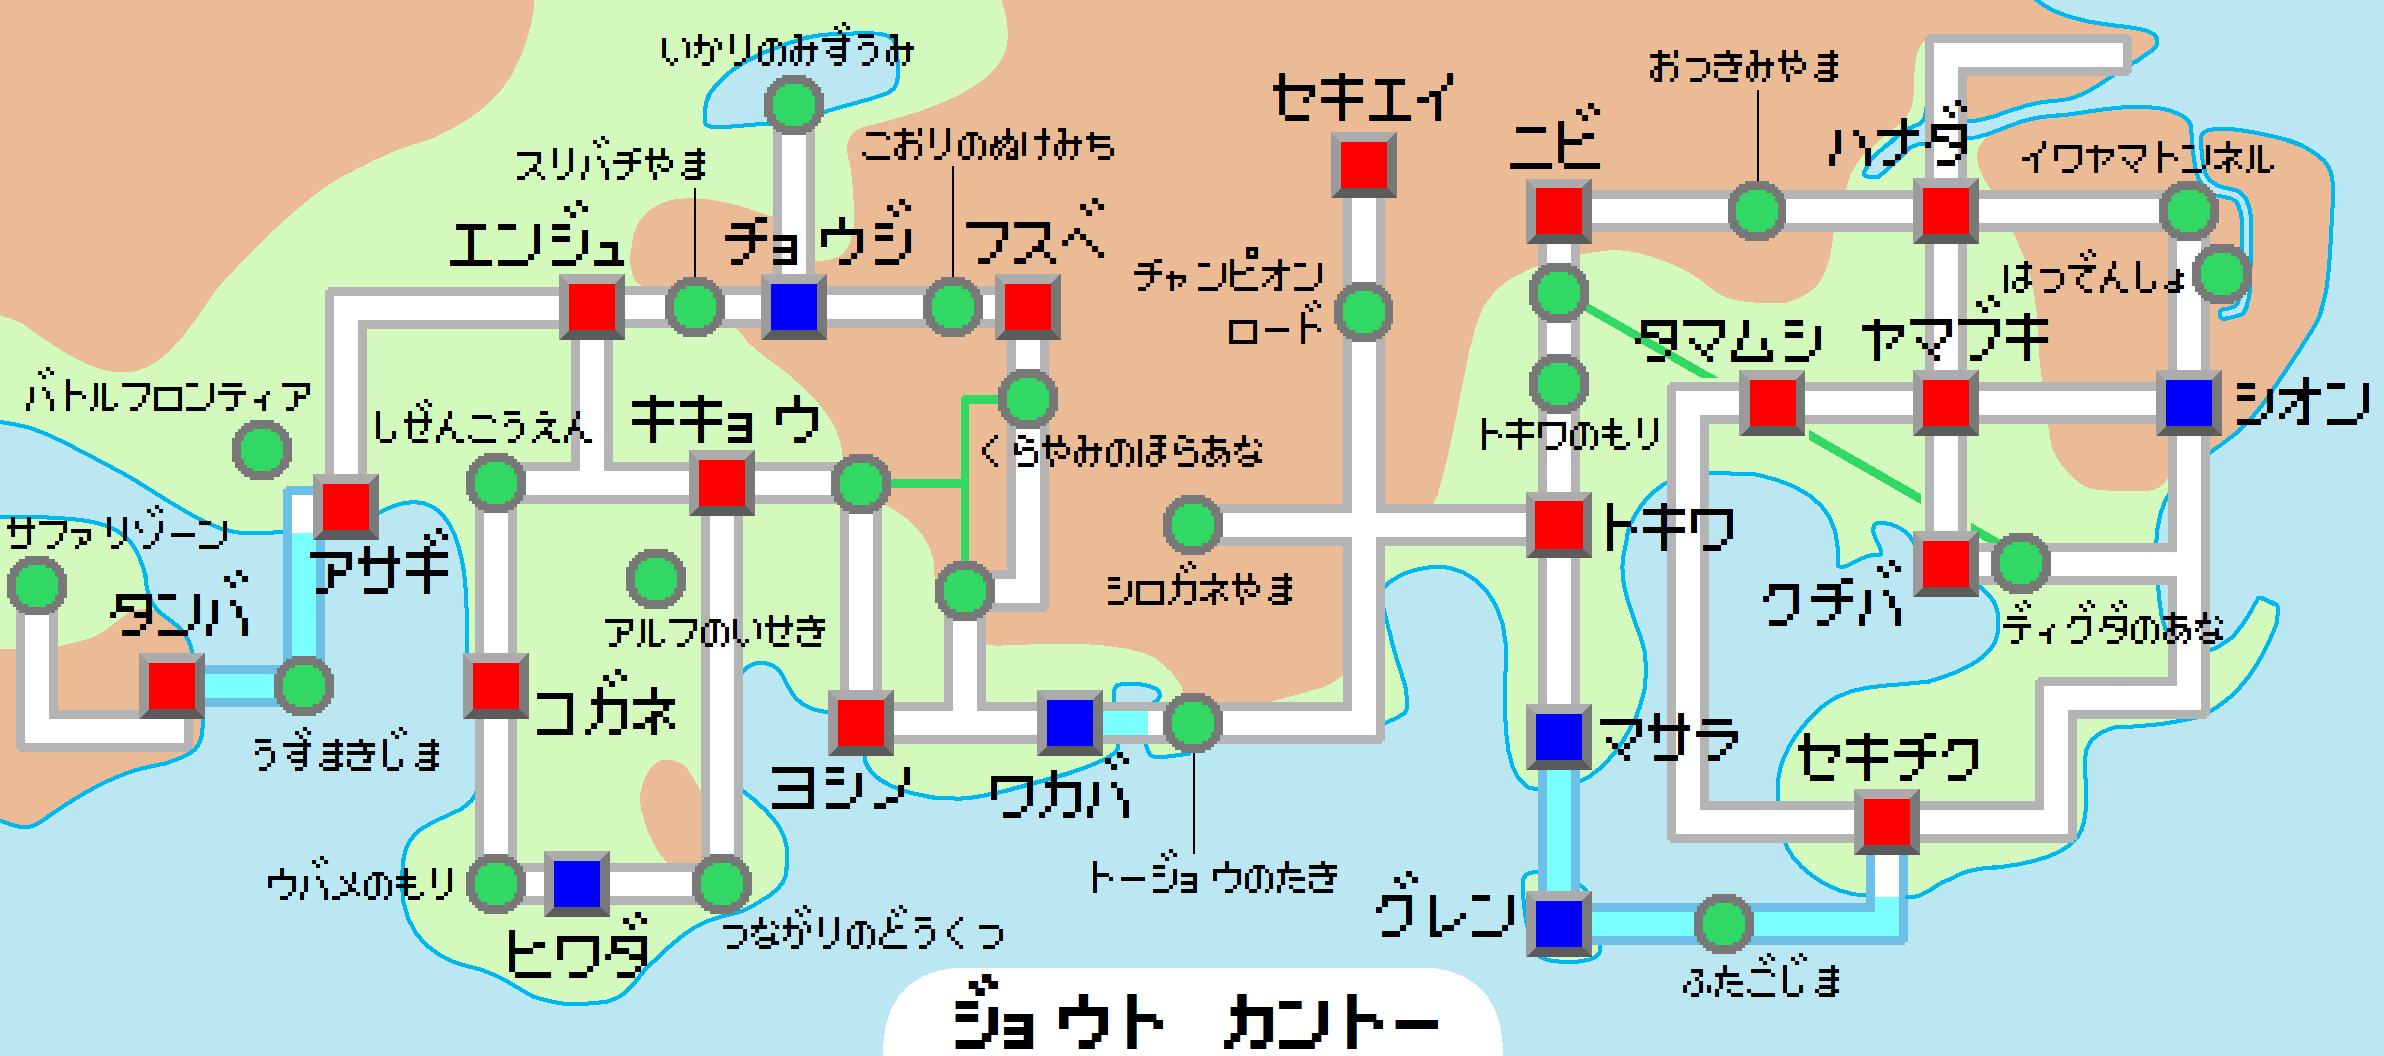 Pokemon Johto Map